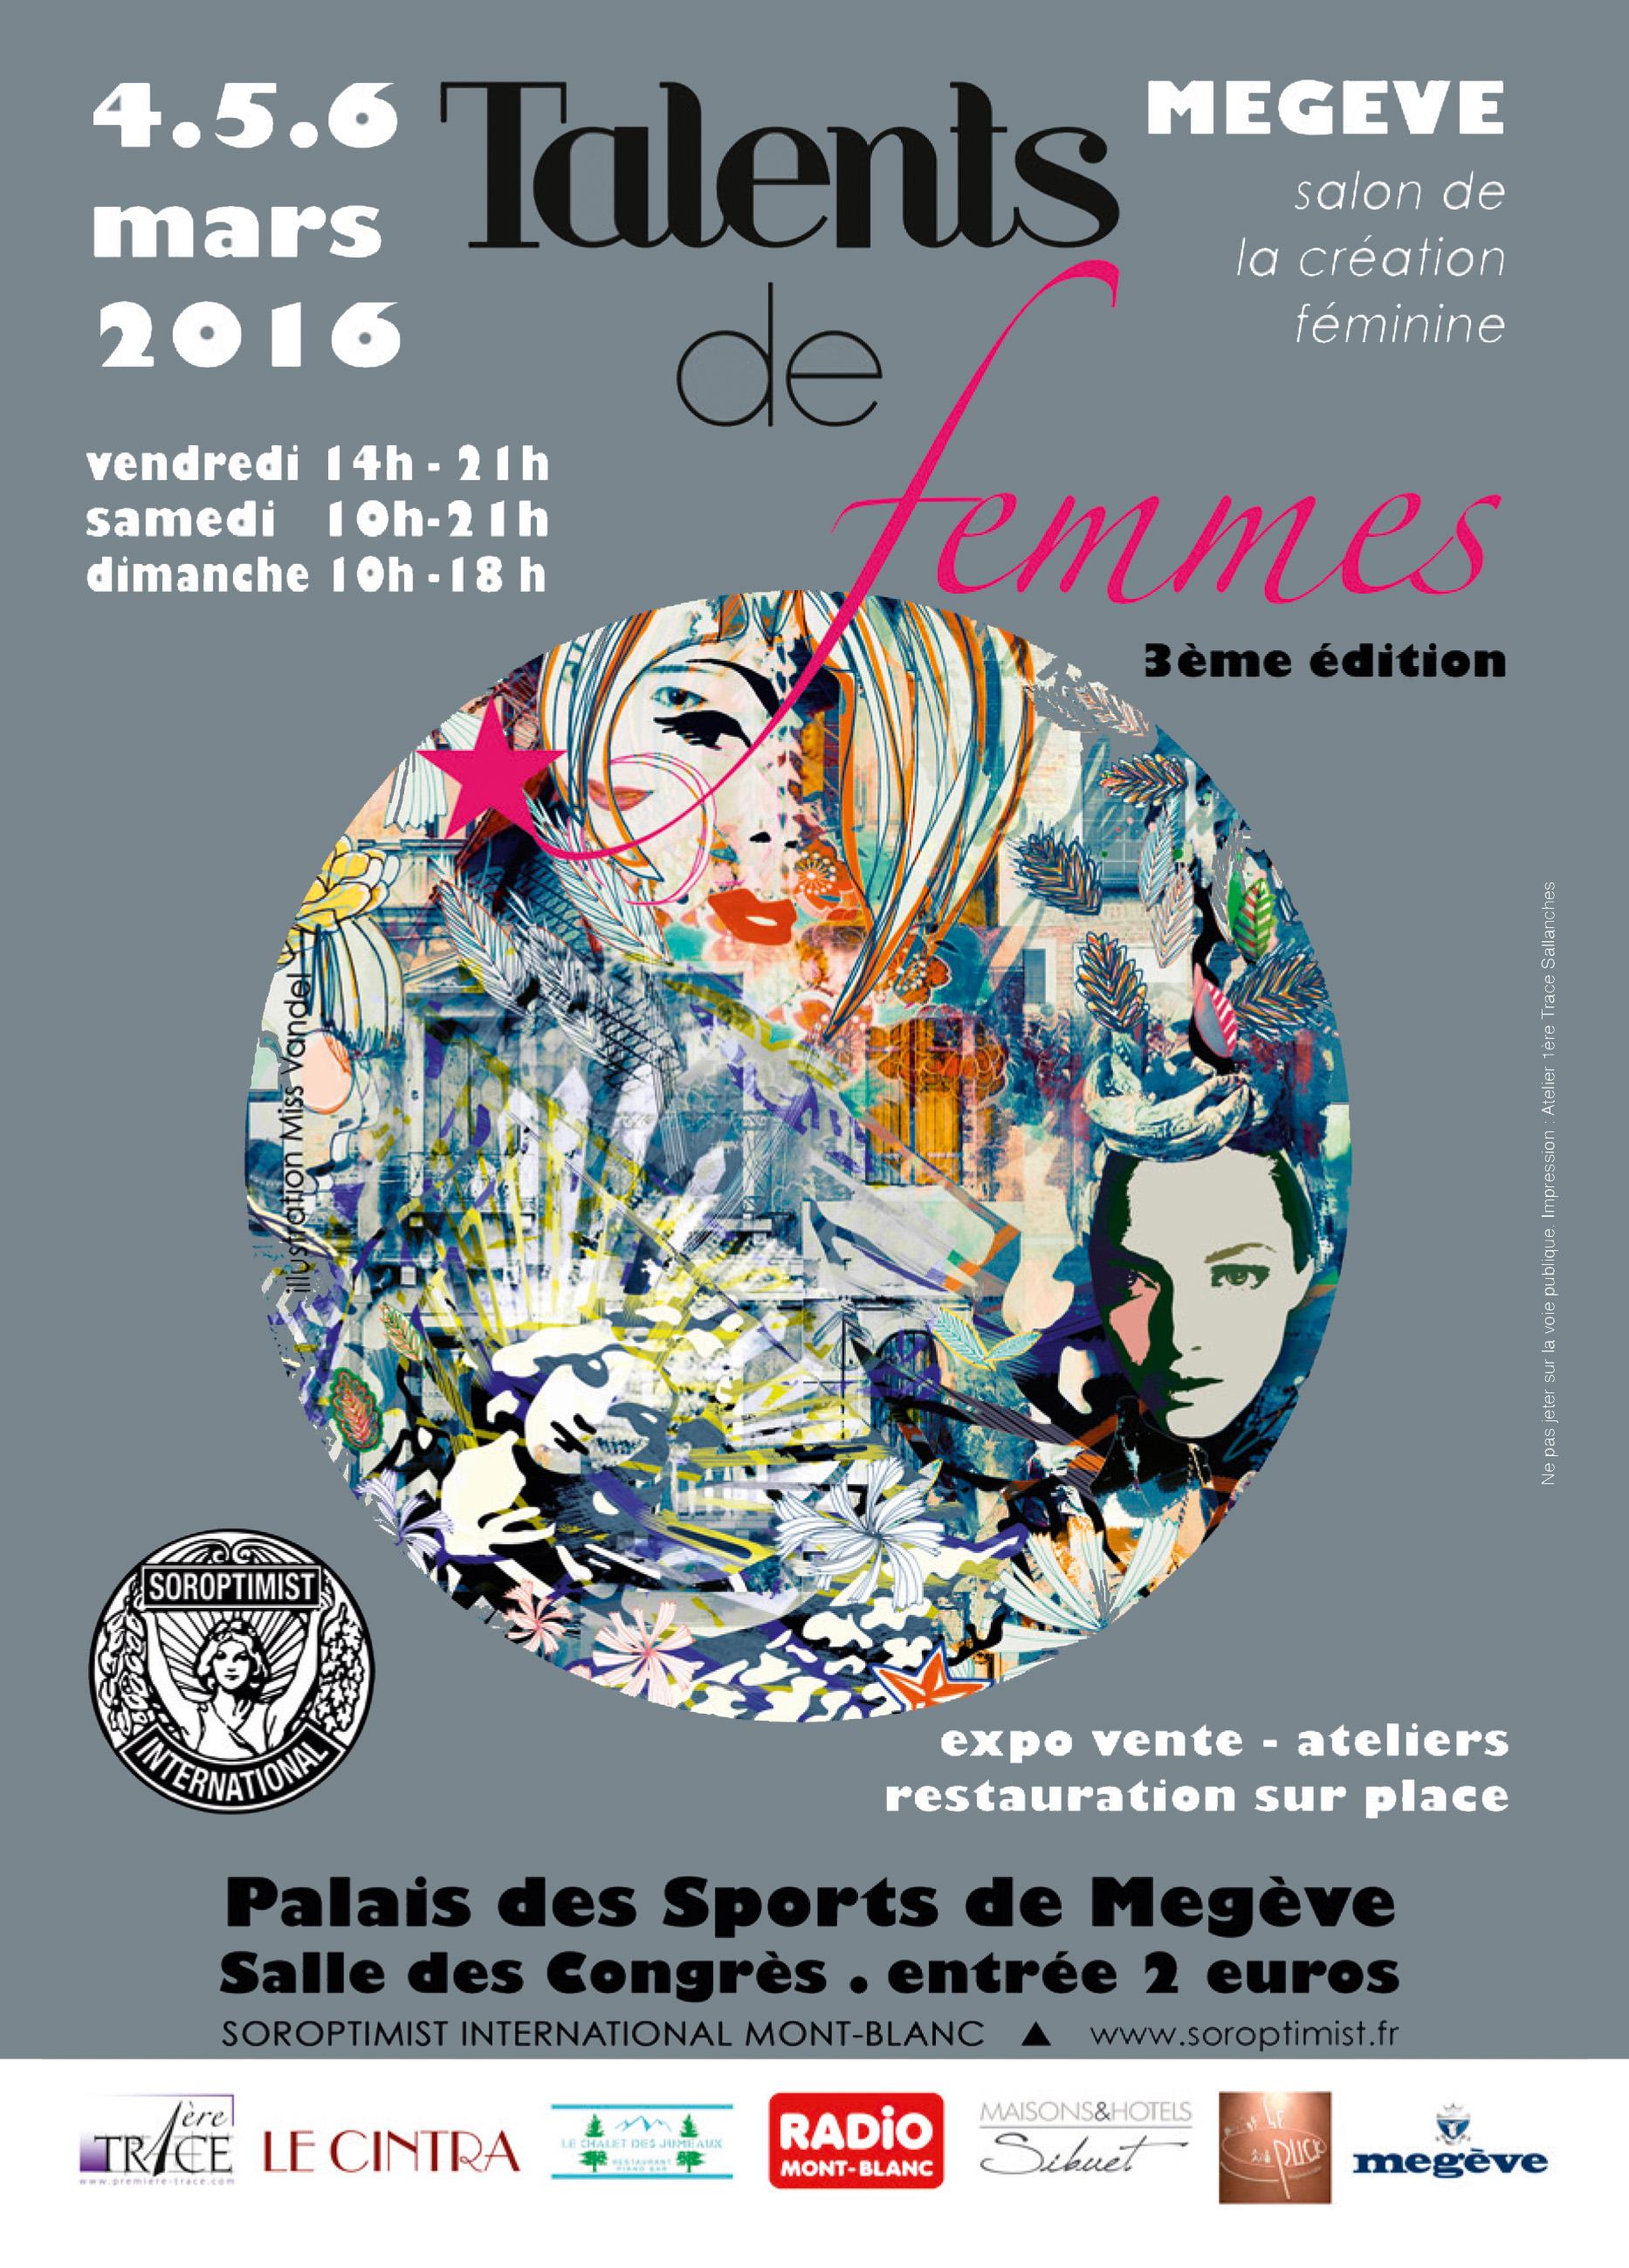 Talents de femmes Megève 2016 avec Lascloe